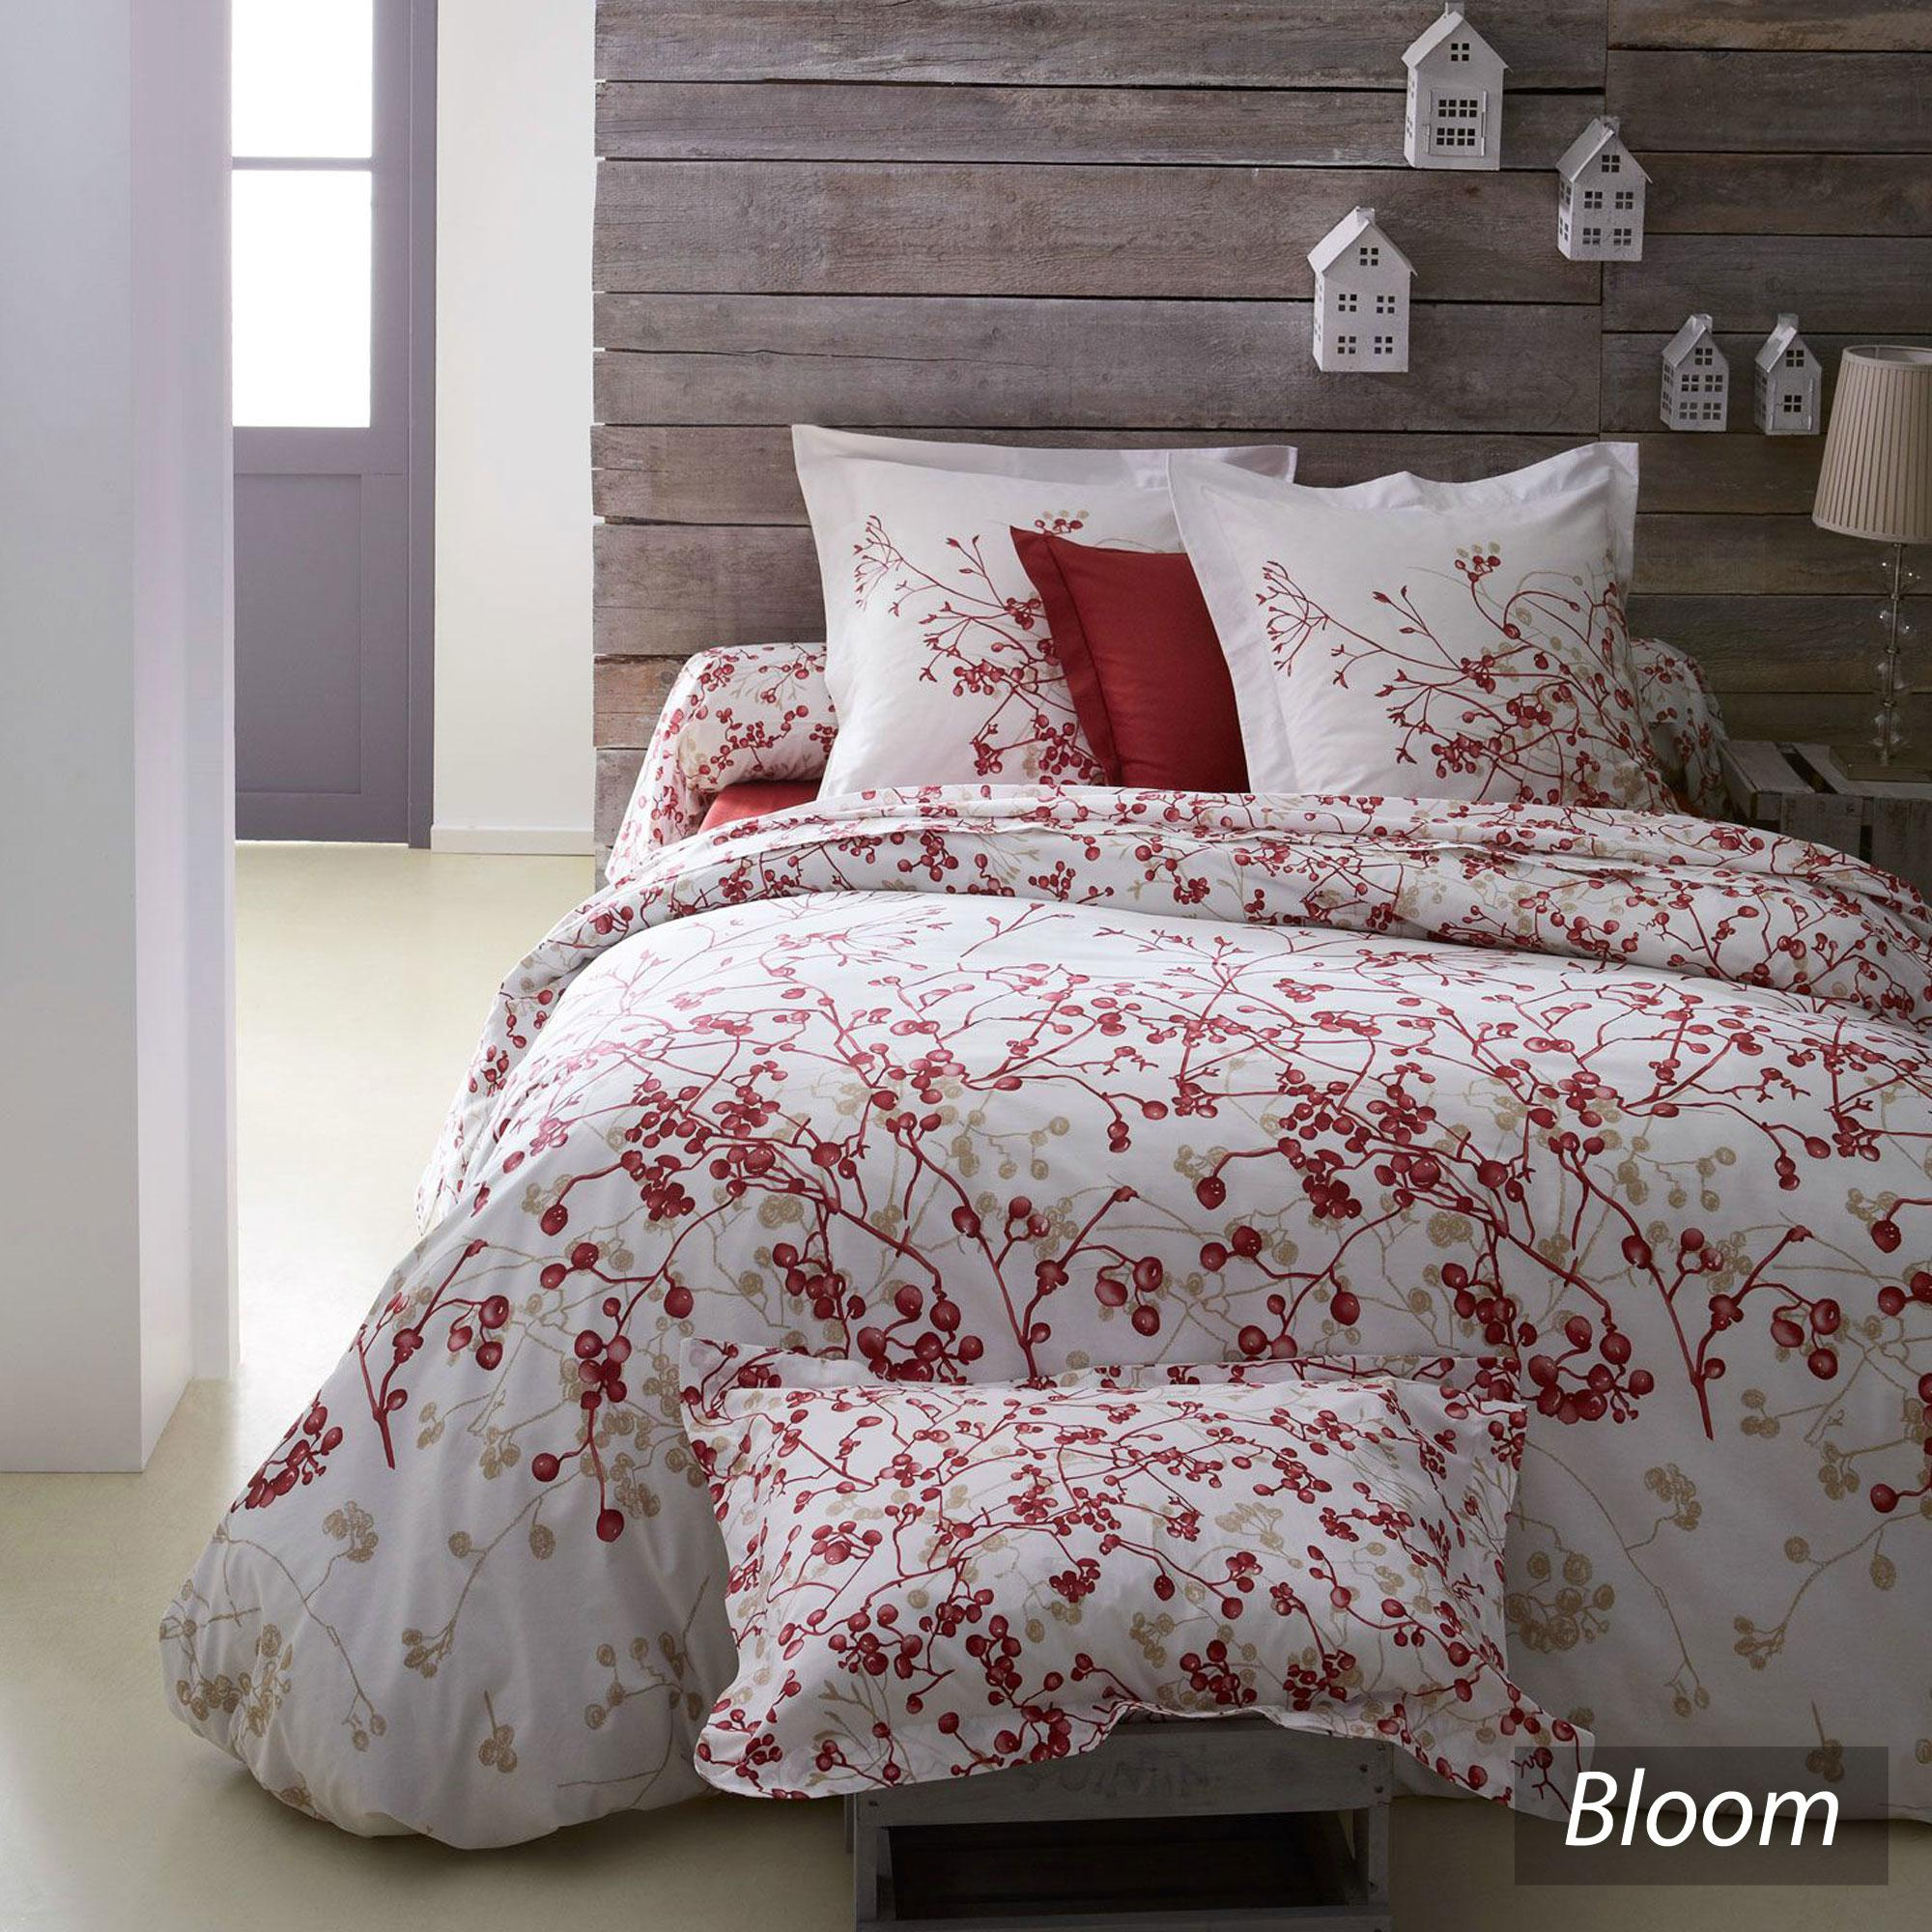 prix des housse couette 187. Black Bedroom Furniture Sets. Home Design Ideas